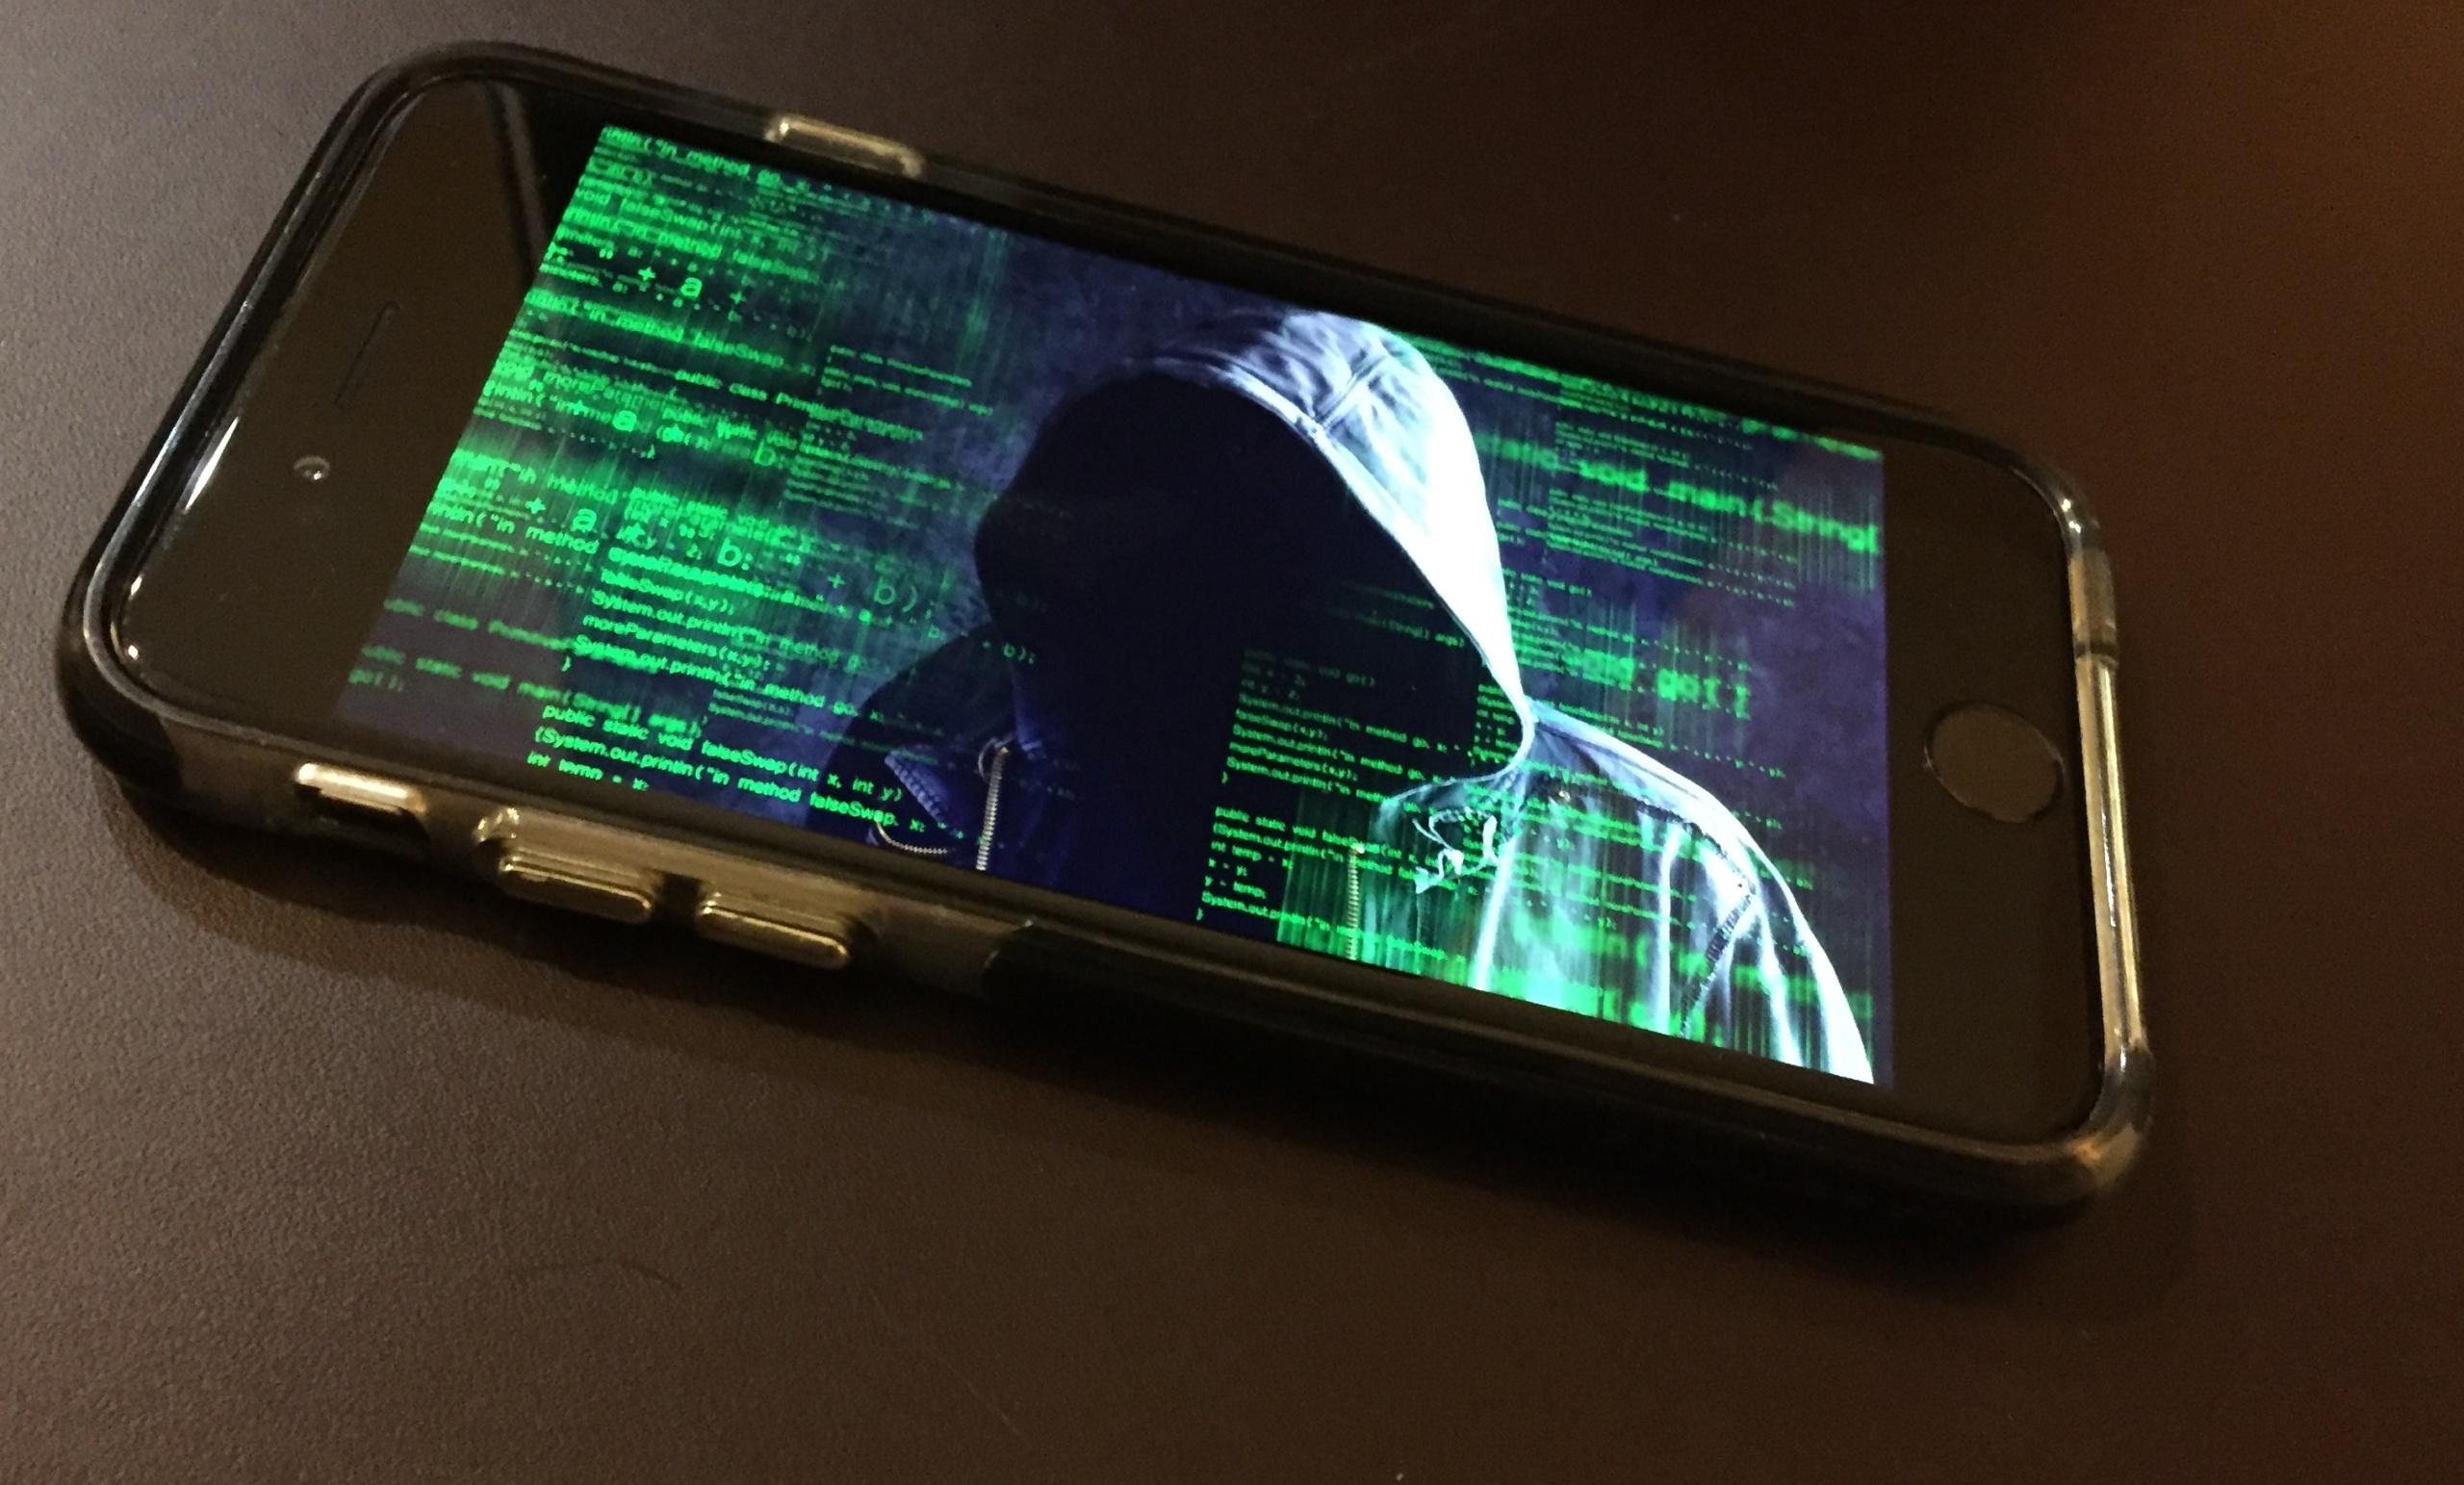 Cell-Phone-Counter-Surveillance-1